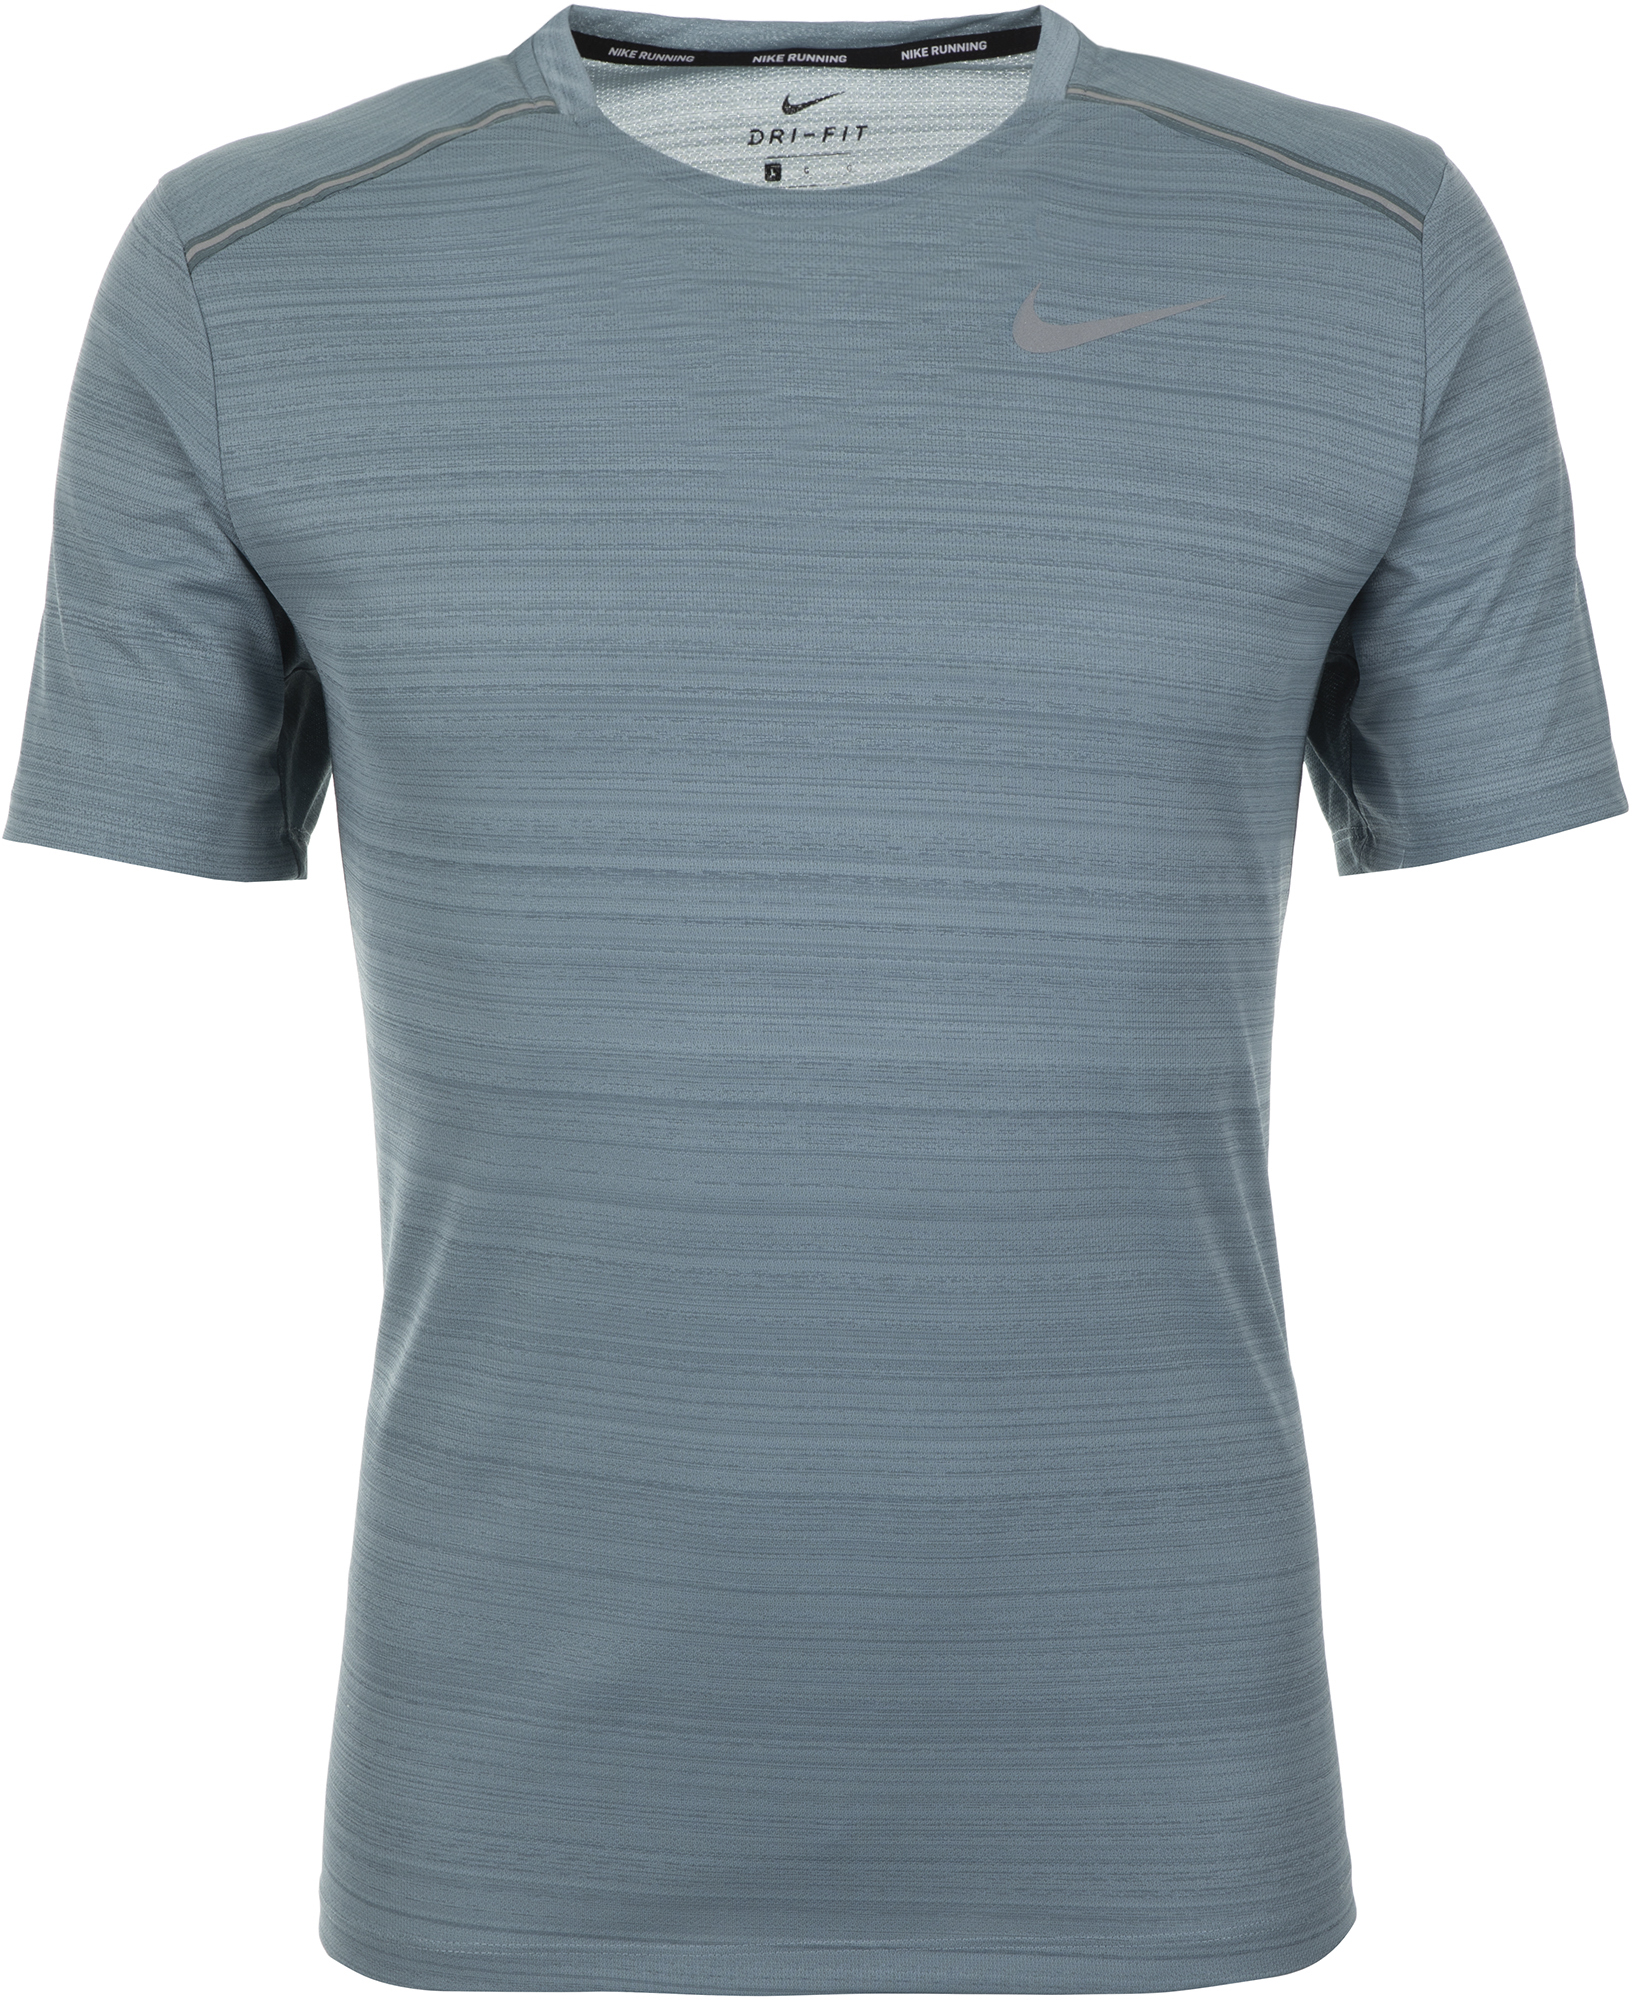 Nike Футболка мужская Nike Miler, размер 46-48